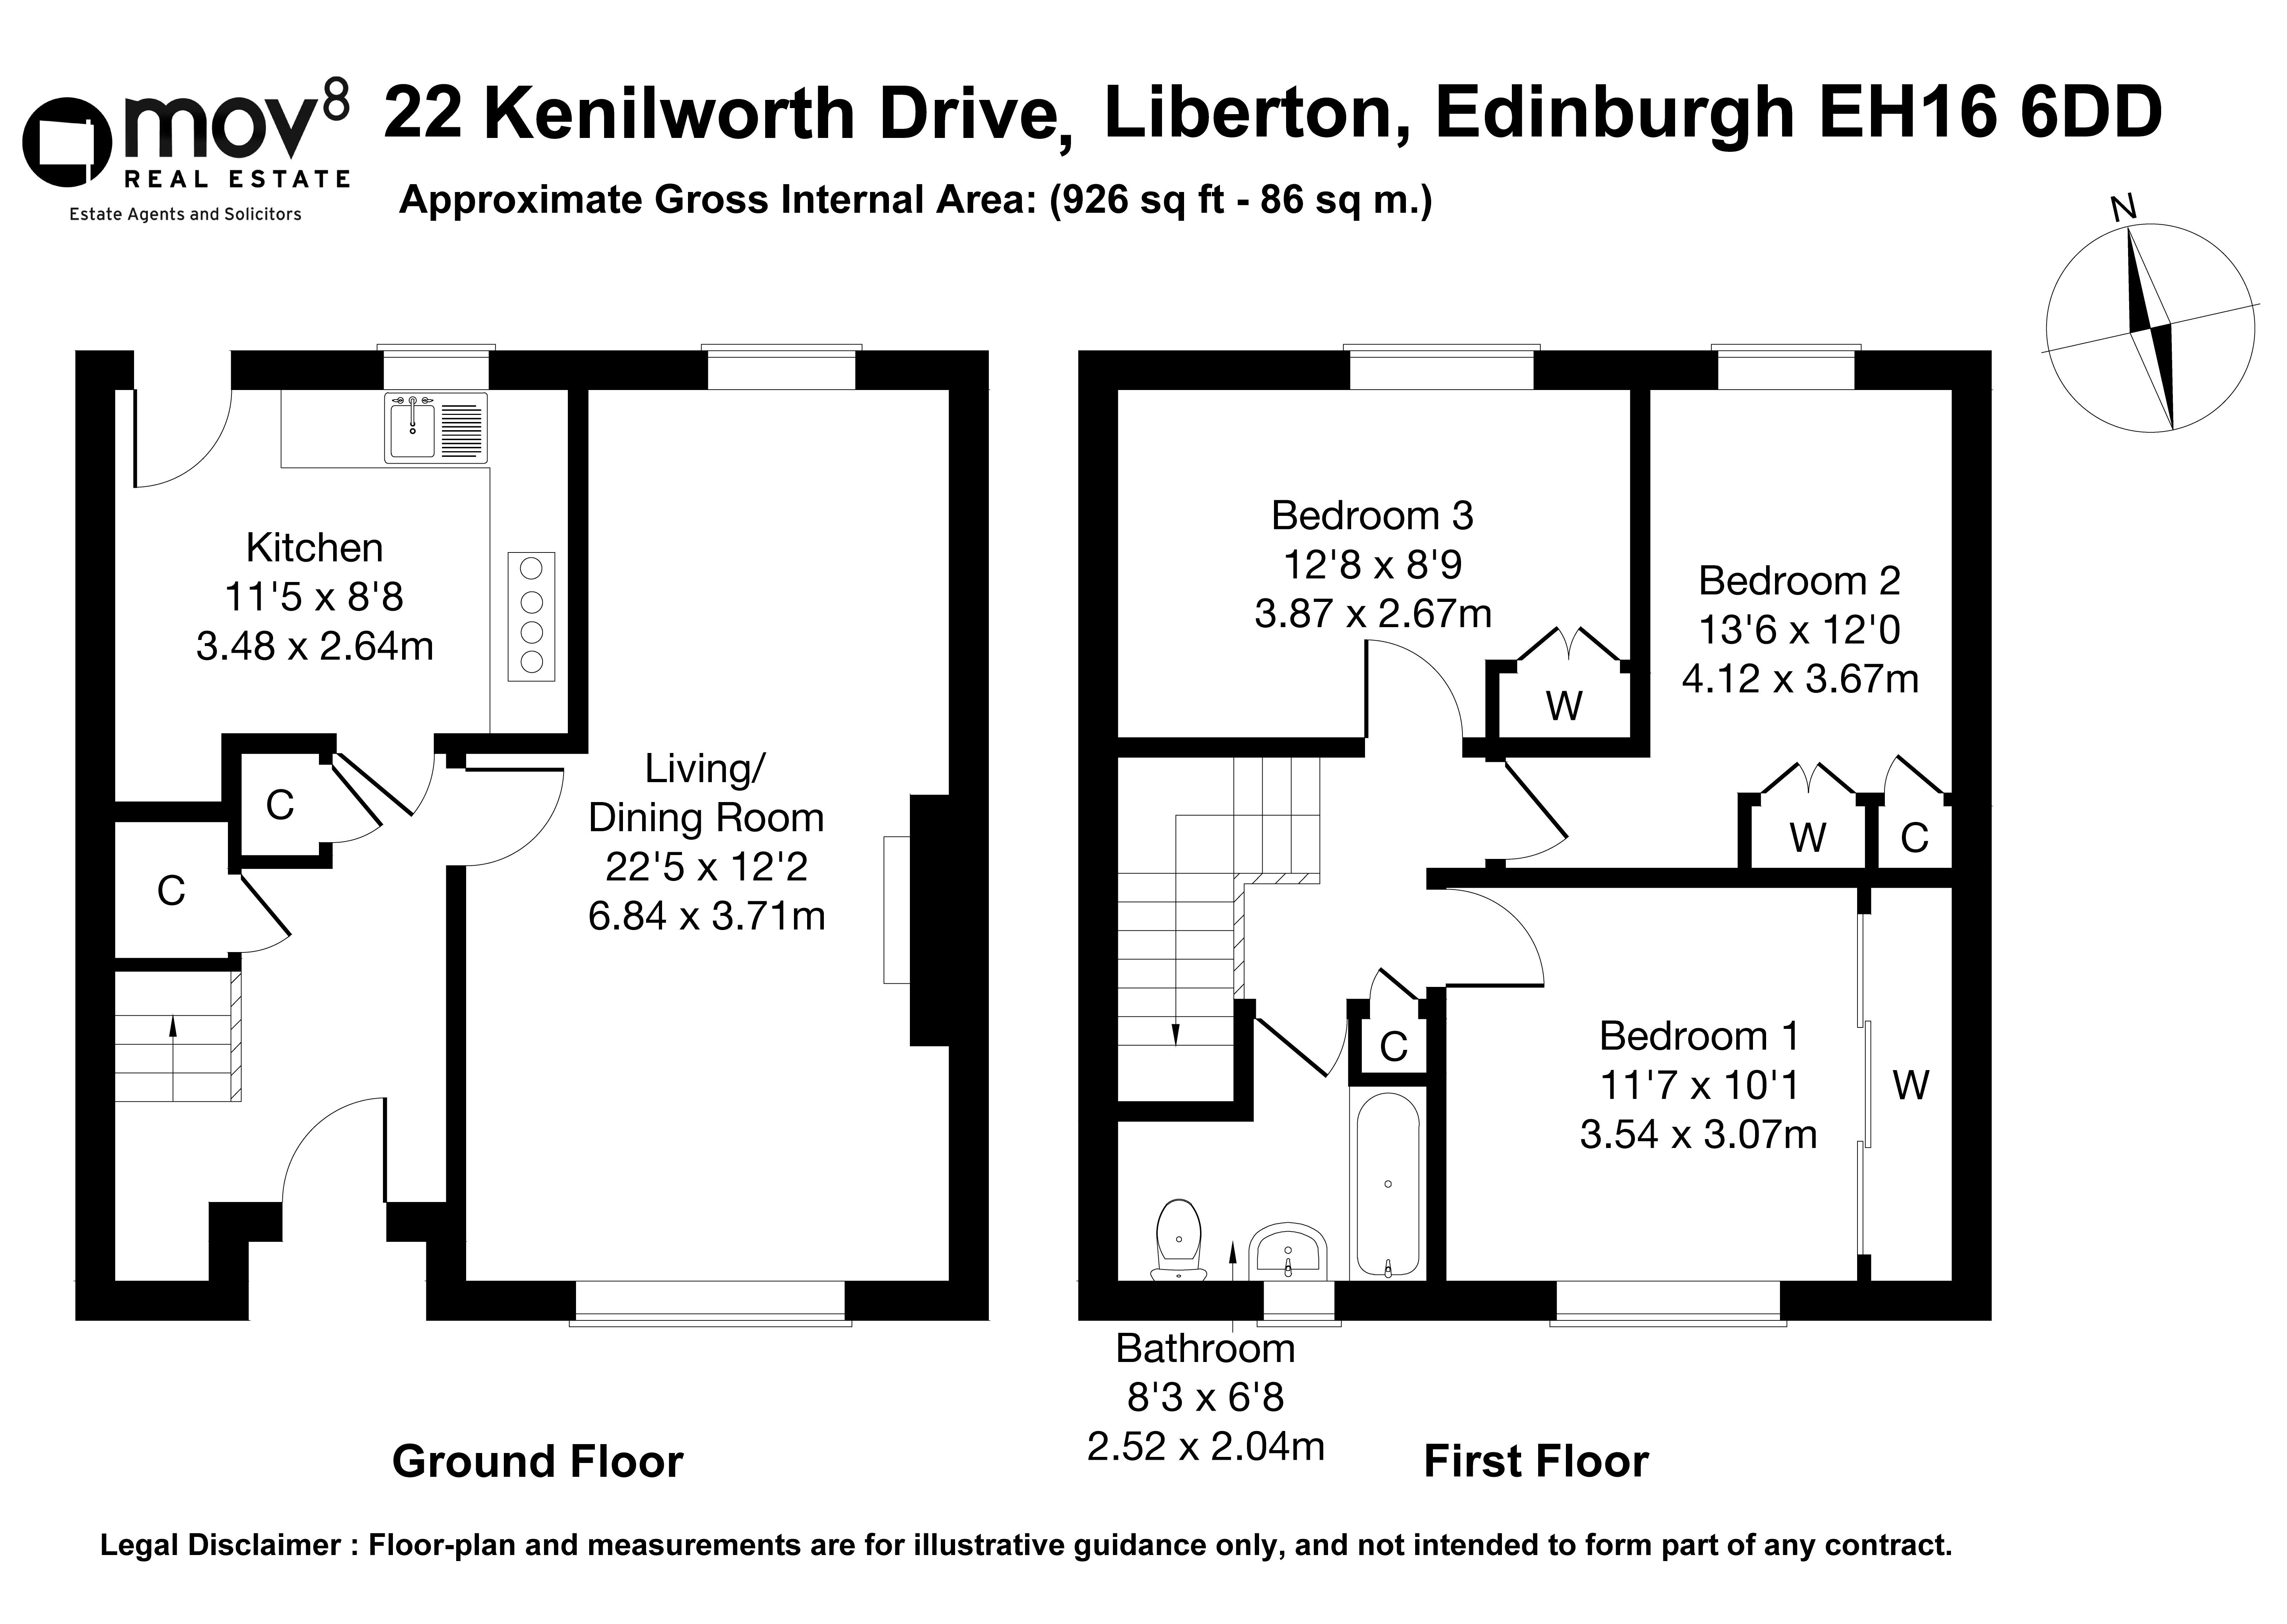 Floorplan 1 of 22 Kenilworth Drive, Liberton, Edinburgh, EH16 6DD